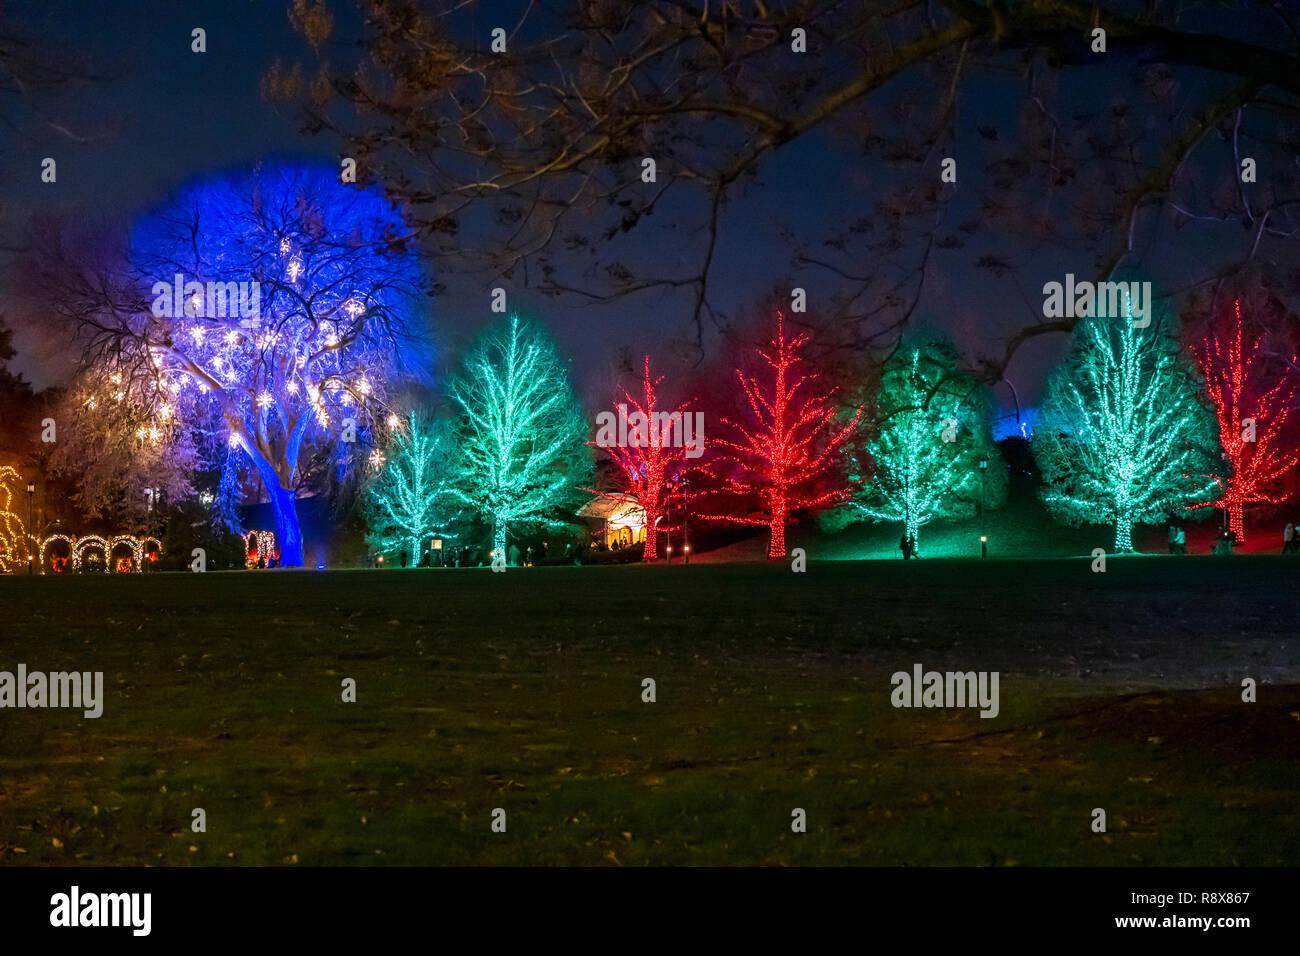 Longwood Gardens Christmas.Night View Of Christmas Lights Decorations Longwood